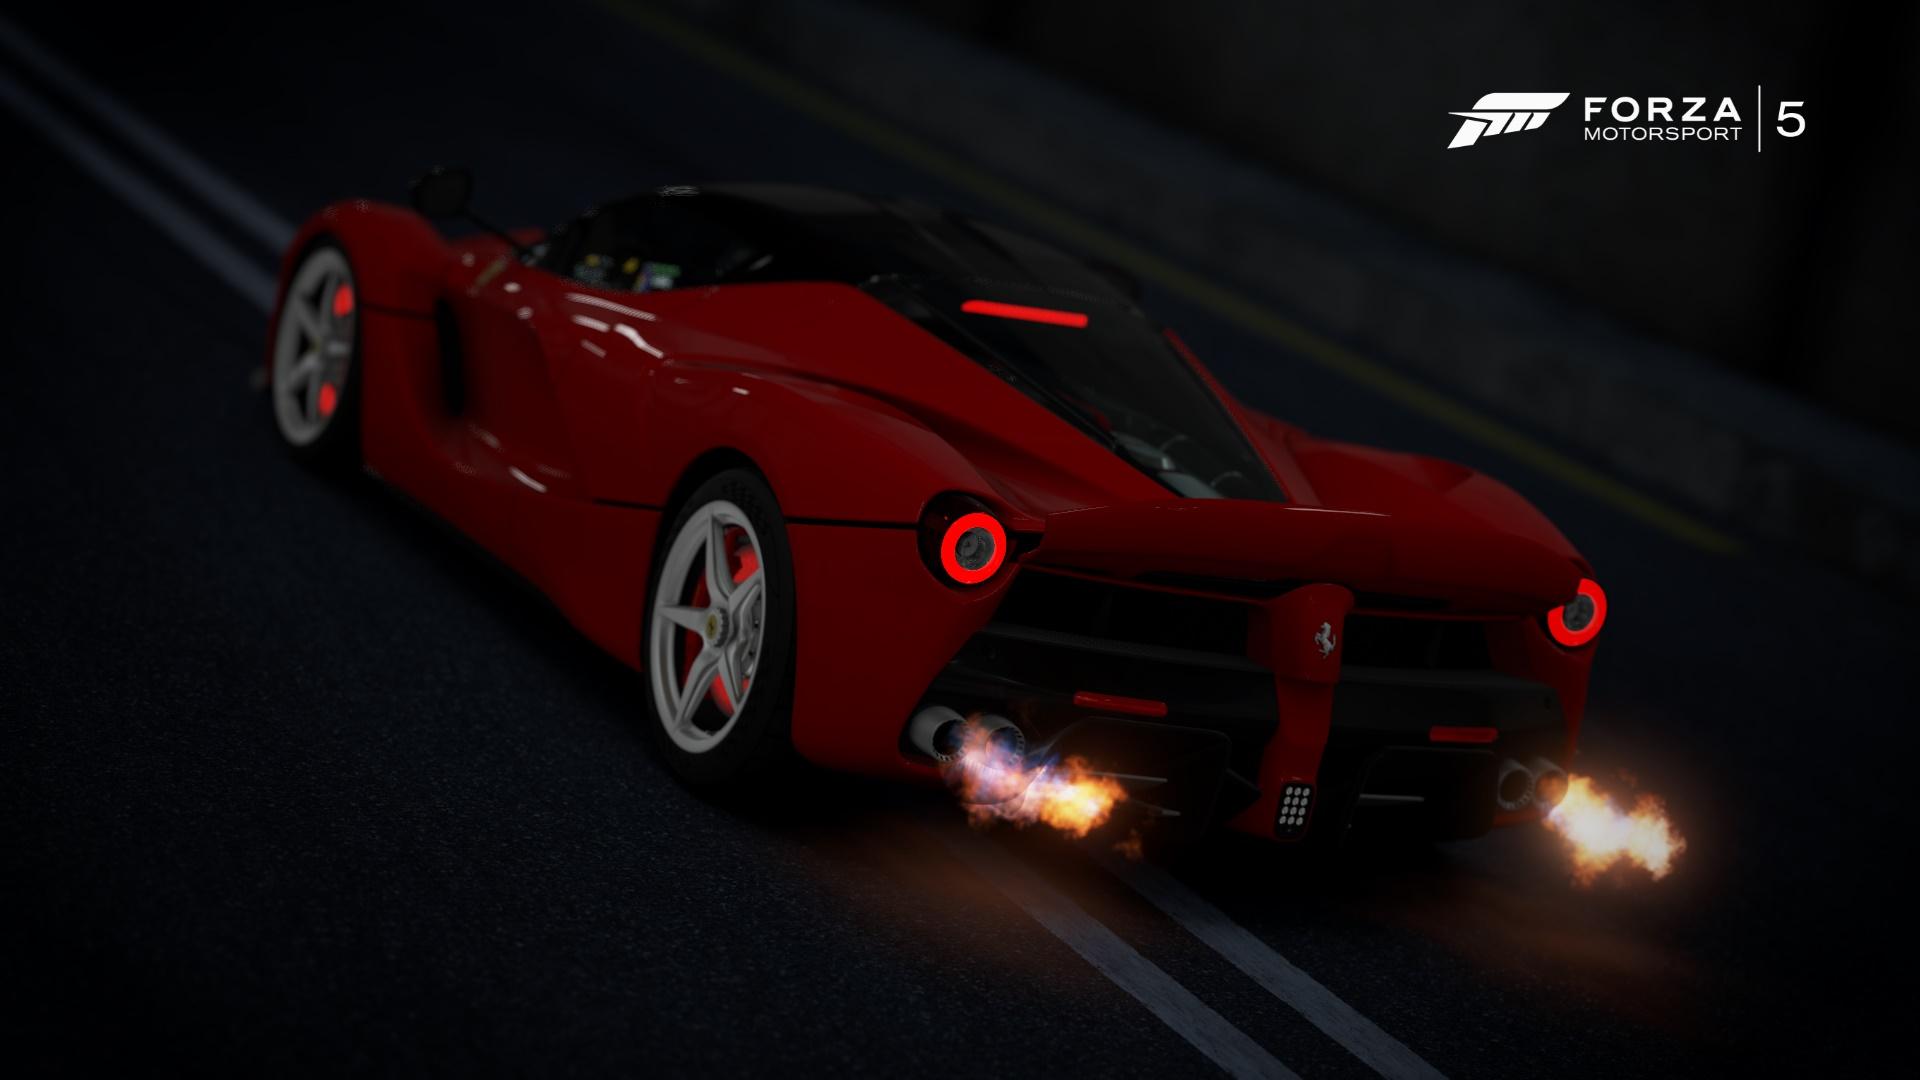 video game forza motorsport 5 wallpaper - Ferrari Laferrari Wallpaper Hd For Desktop